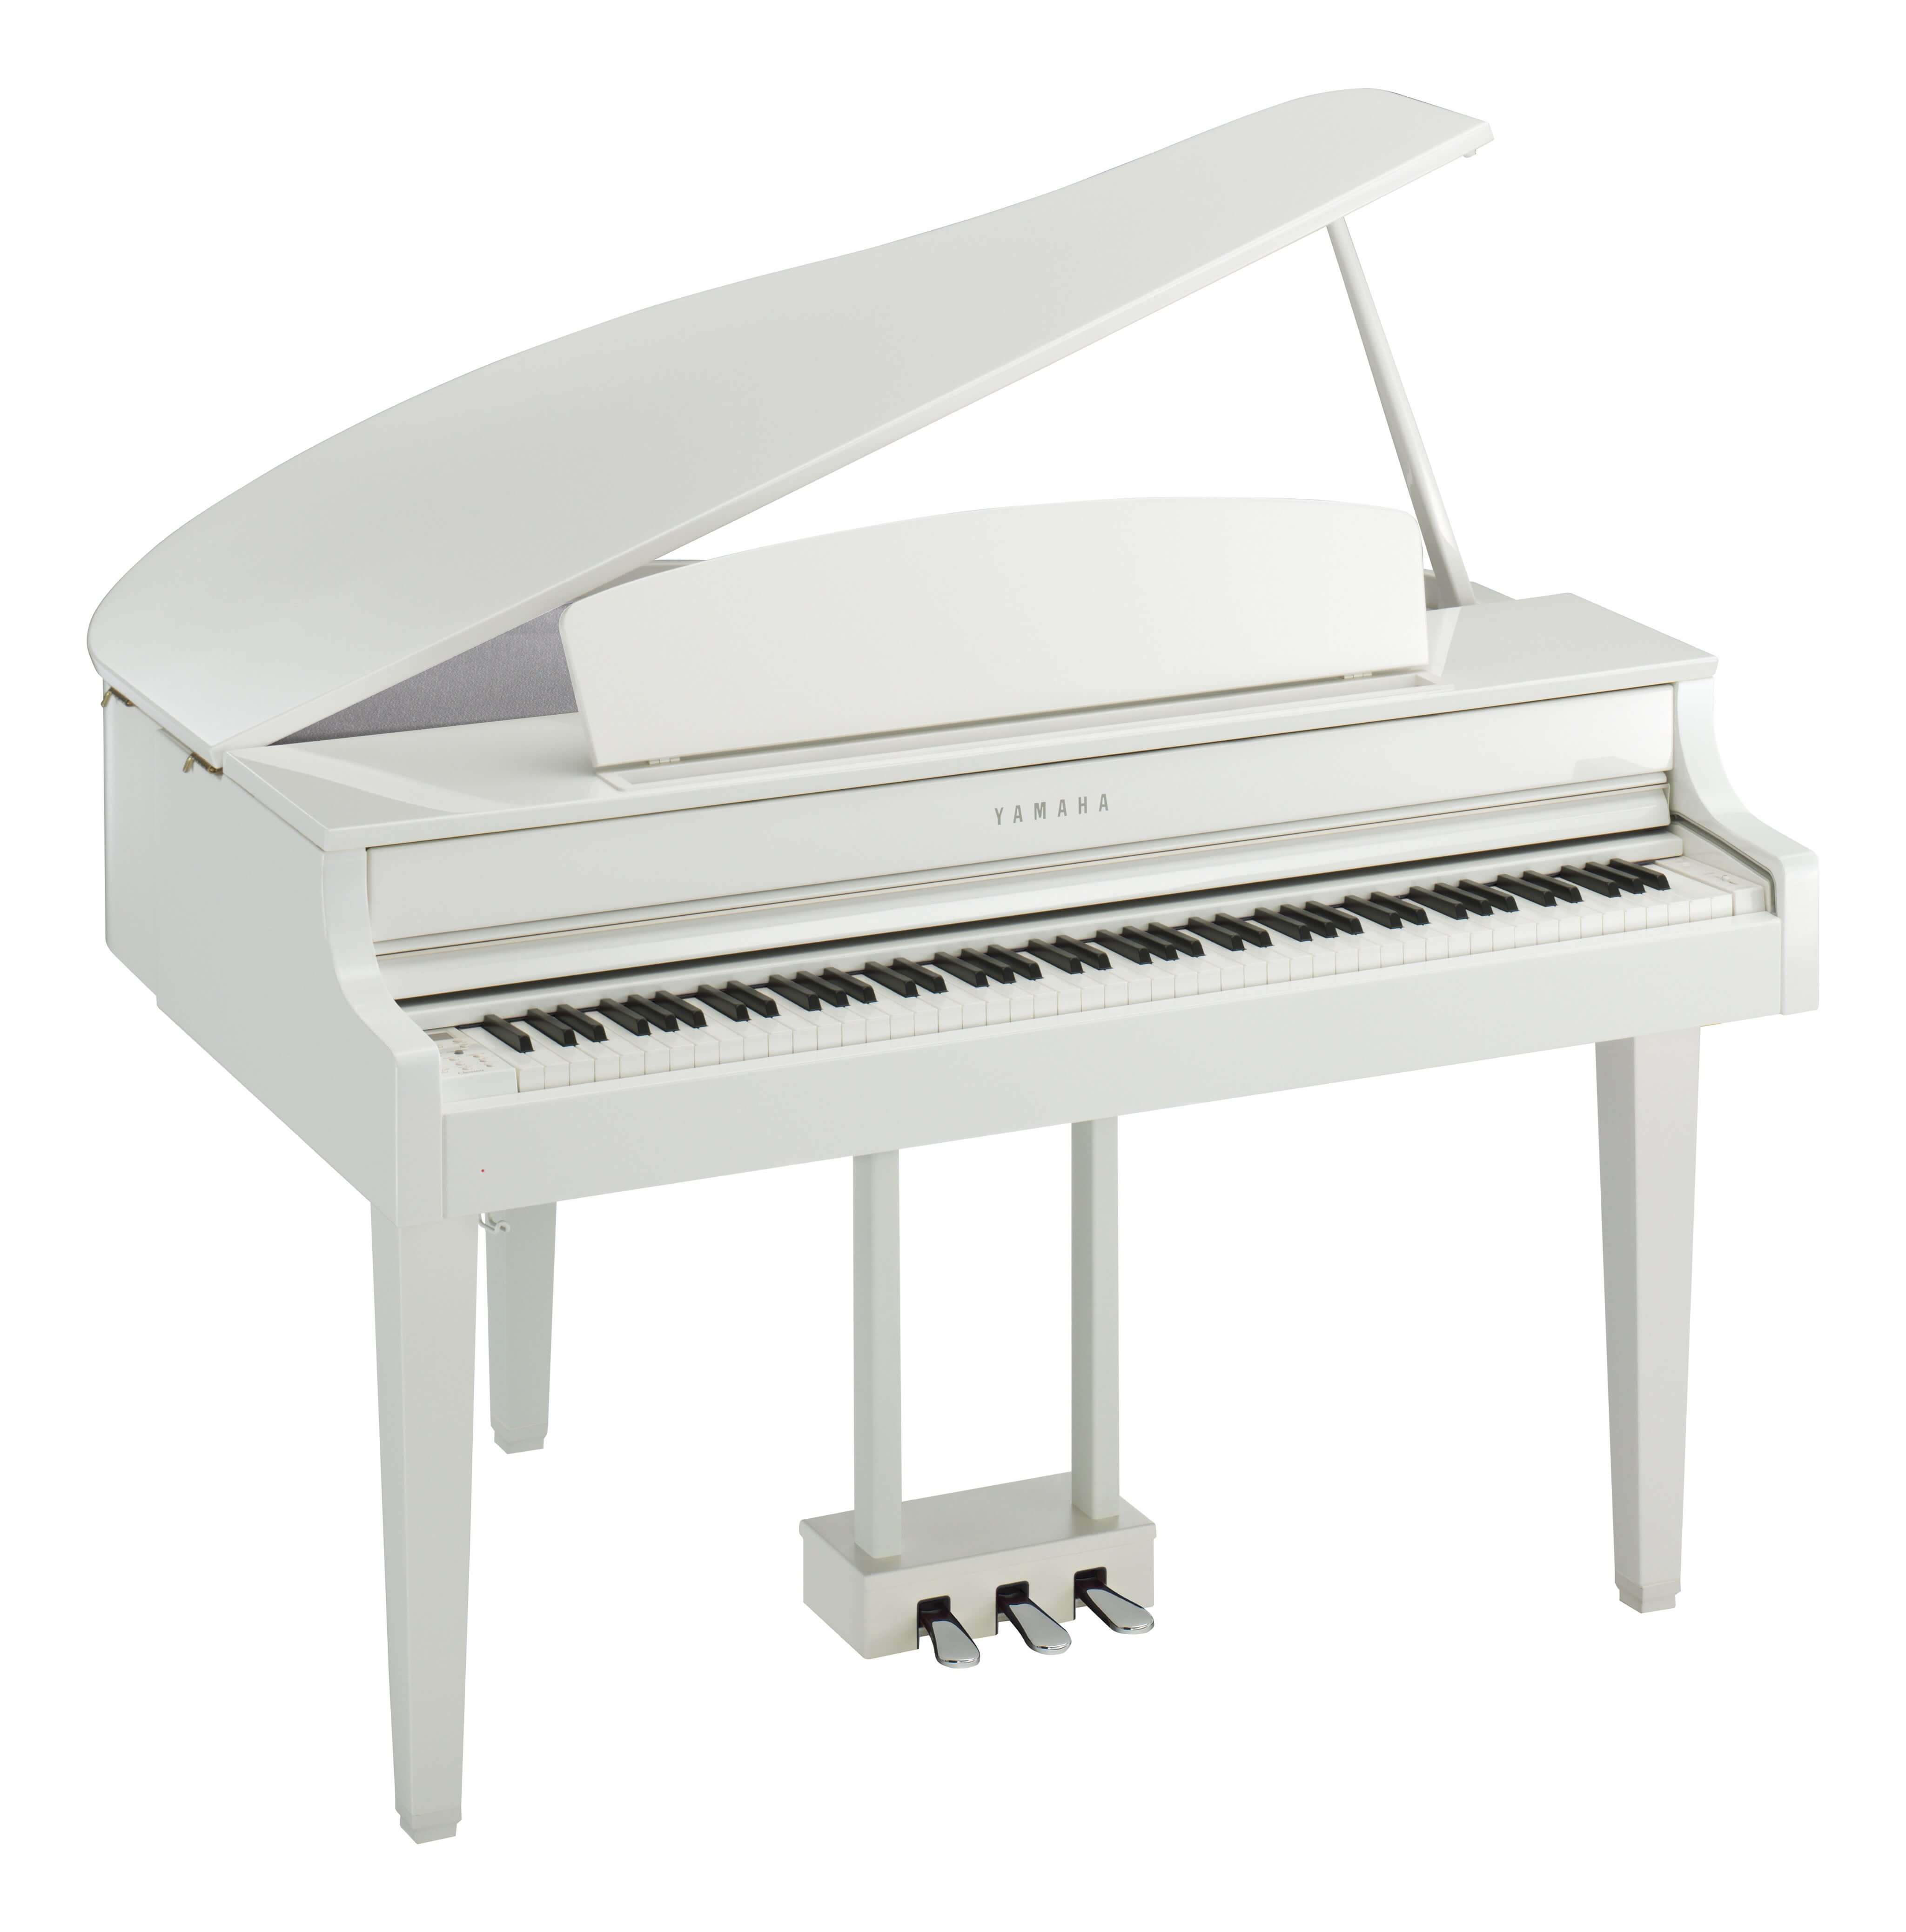 Piano Digital Yamaha CLP-665GPWH Blanco Pulido